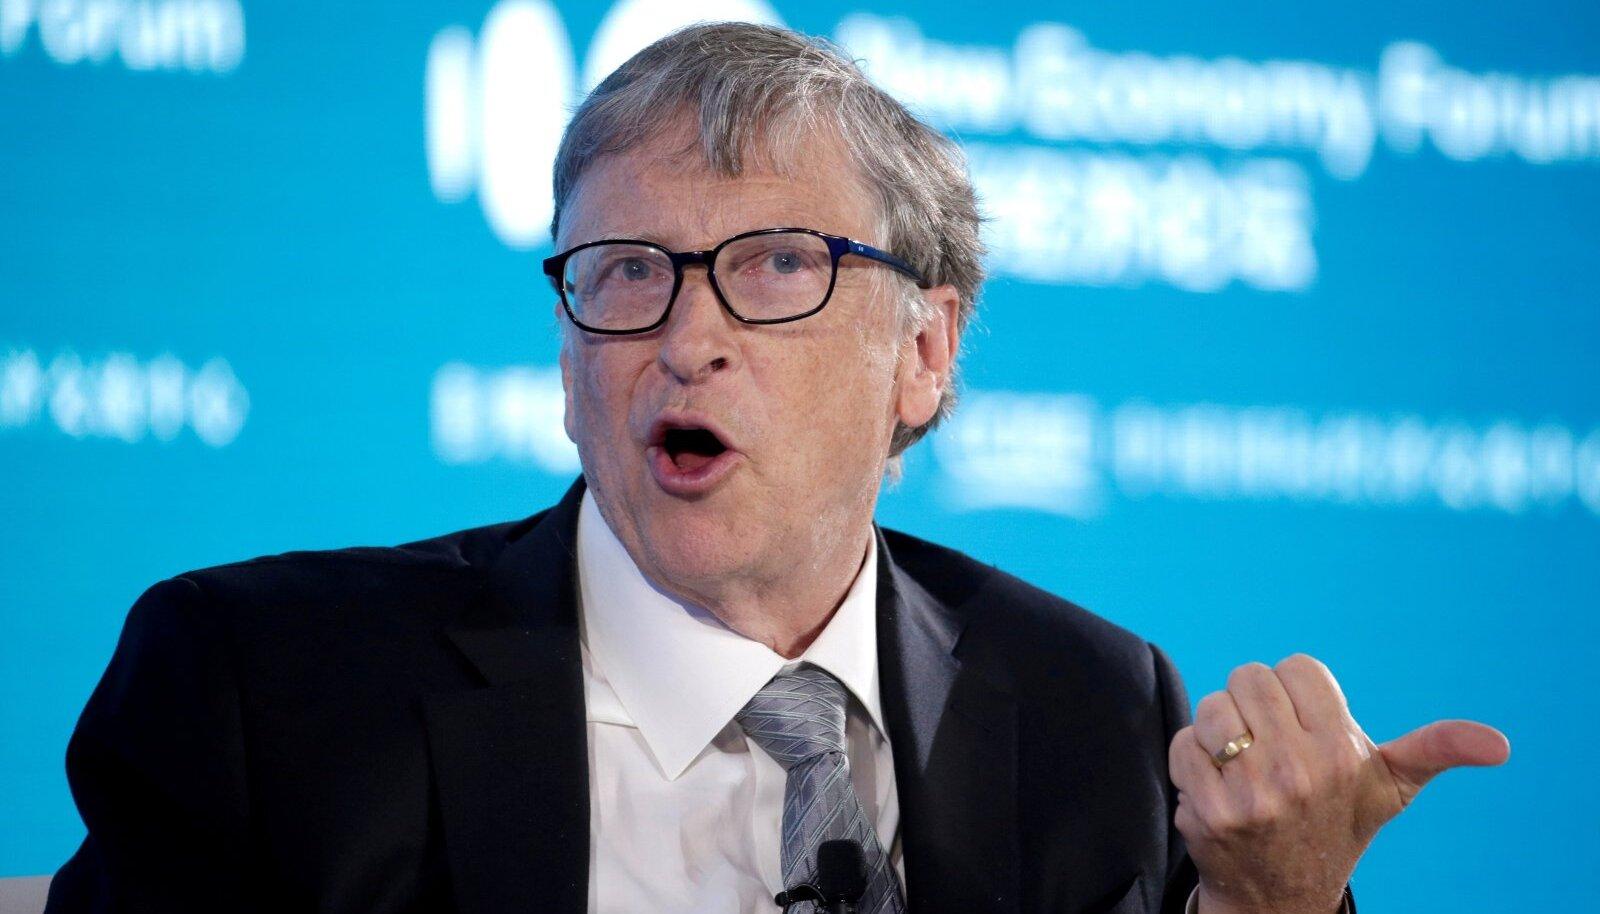 Bill Gates on maski kandmise usku.